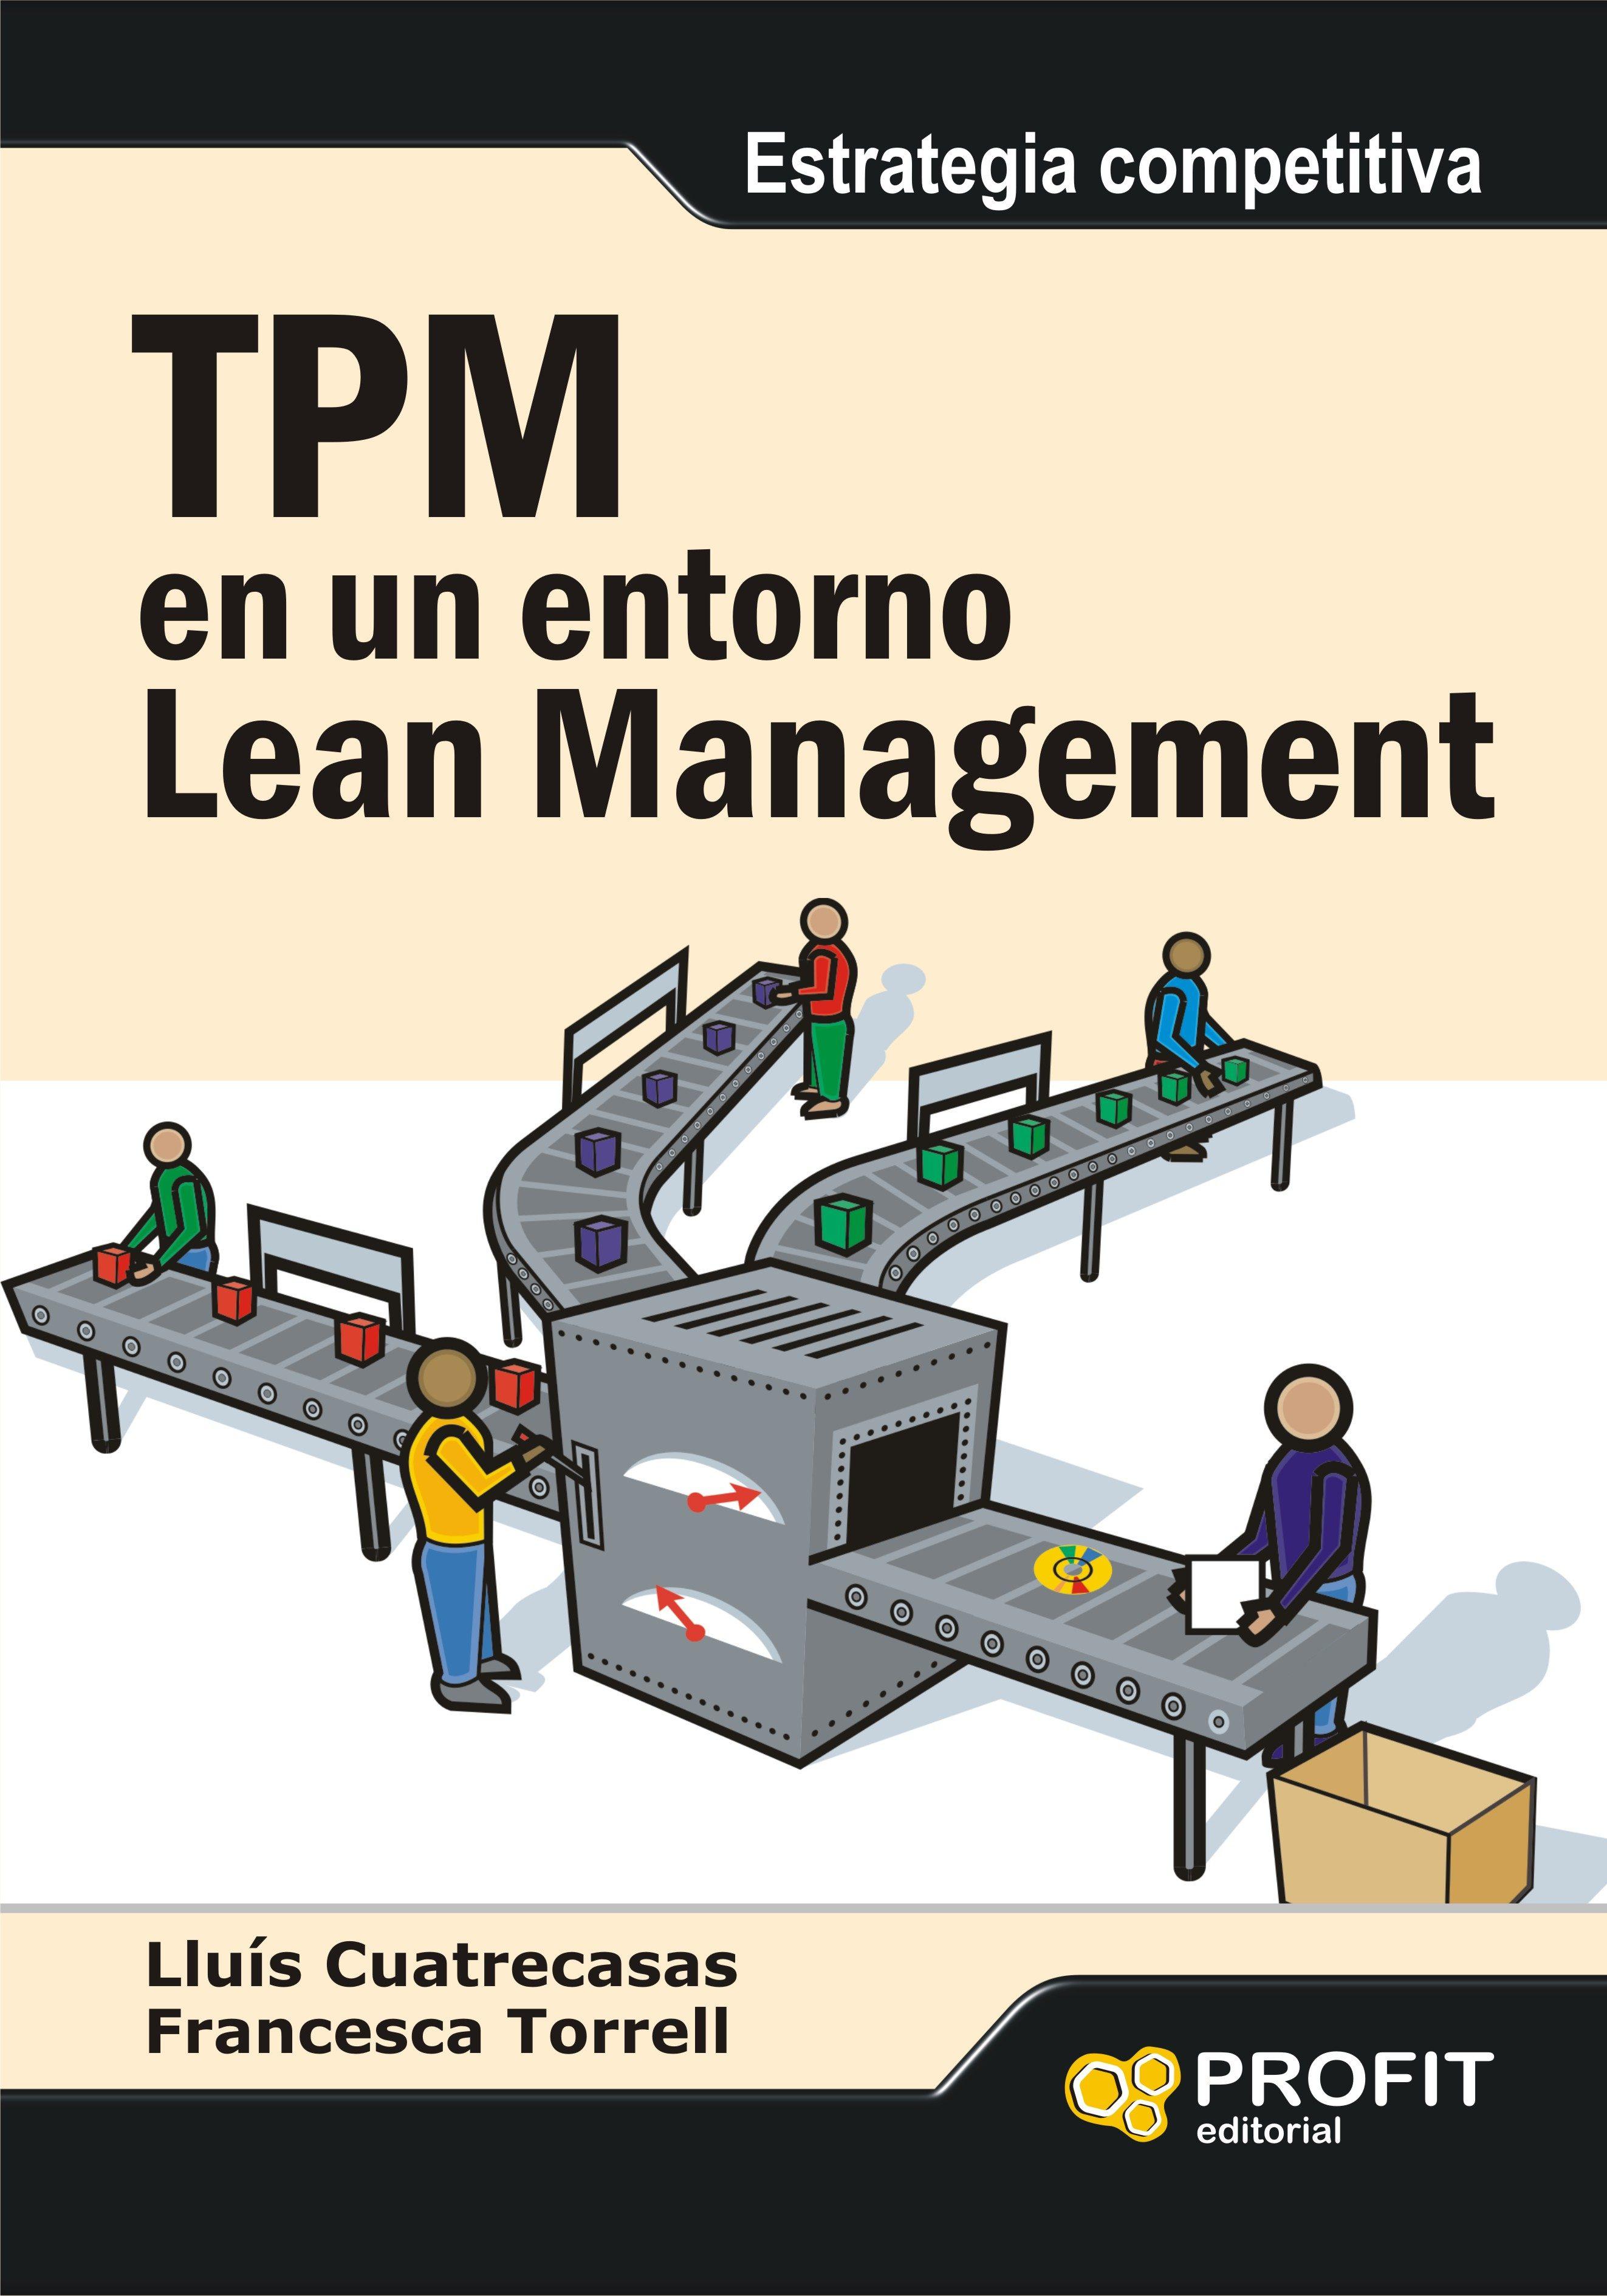 tpm en un entorno lean management-lluis cuatrecasas-9788492956128